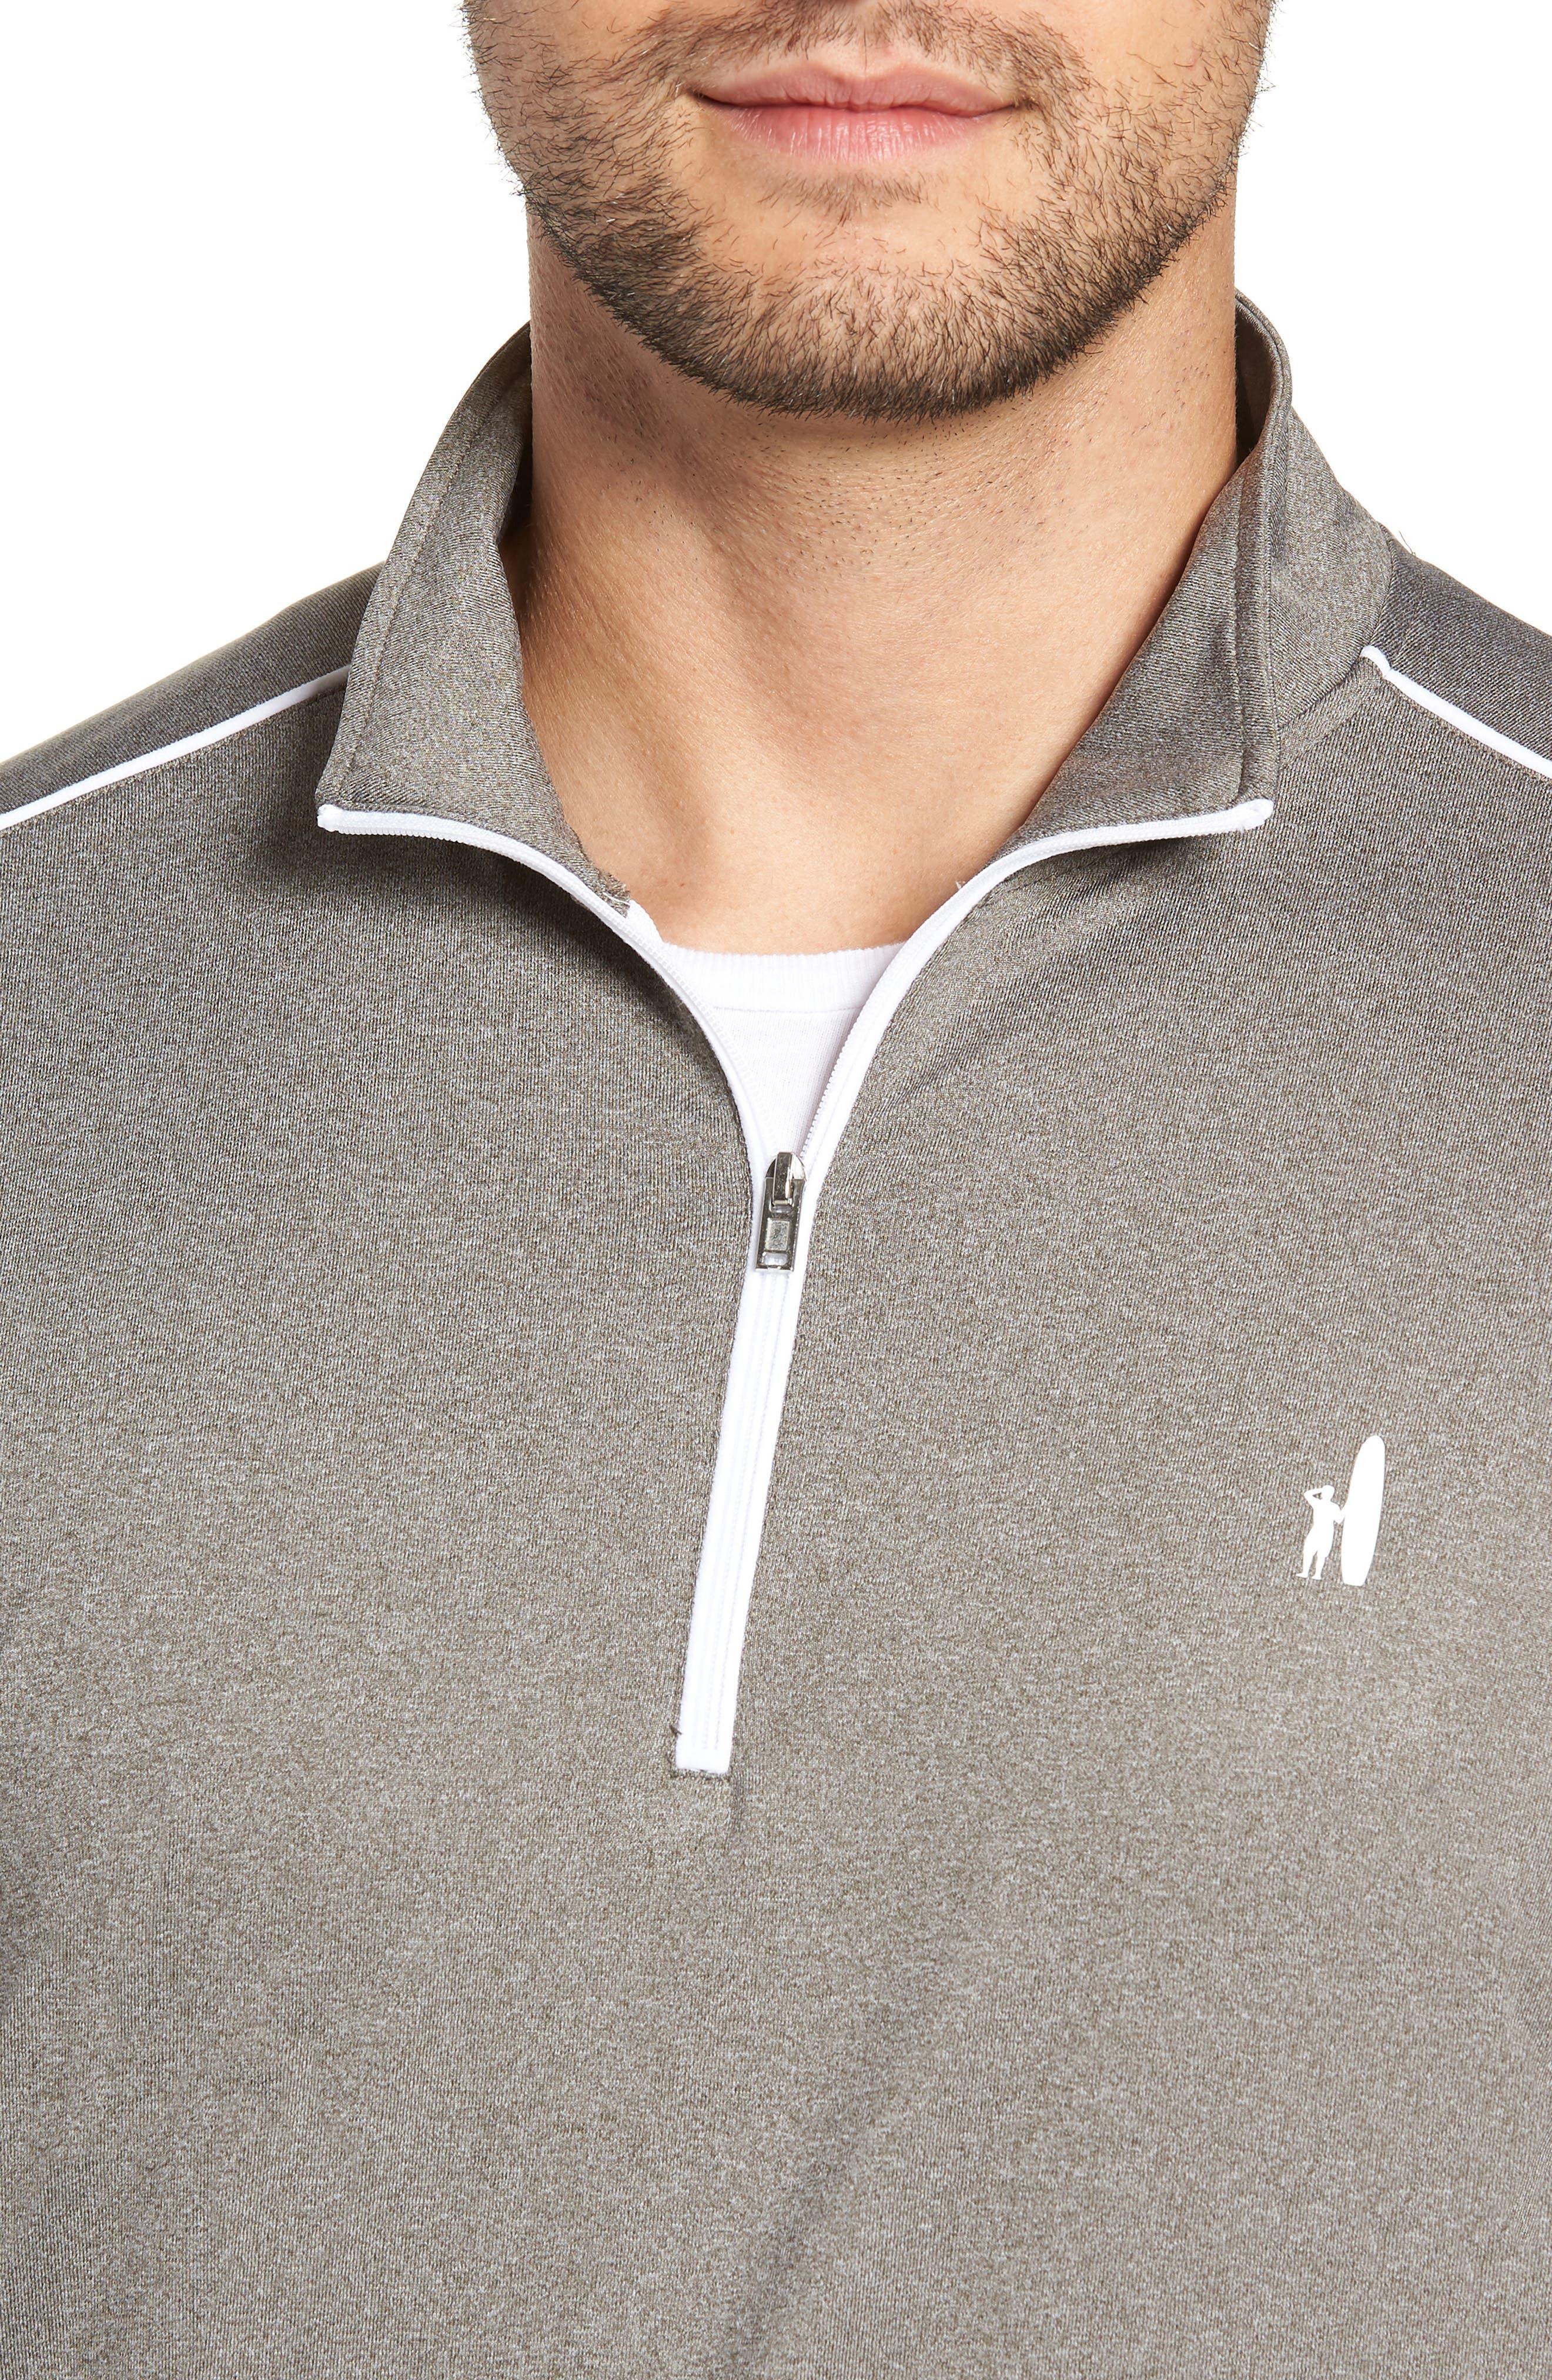 Lammie Regular Fit Quarter Zip Prep-Formance Pullover,                             Alternate thumbnail 4, color,                             METEOR